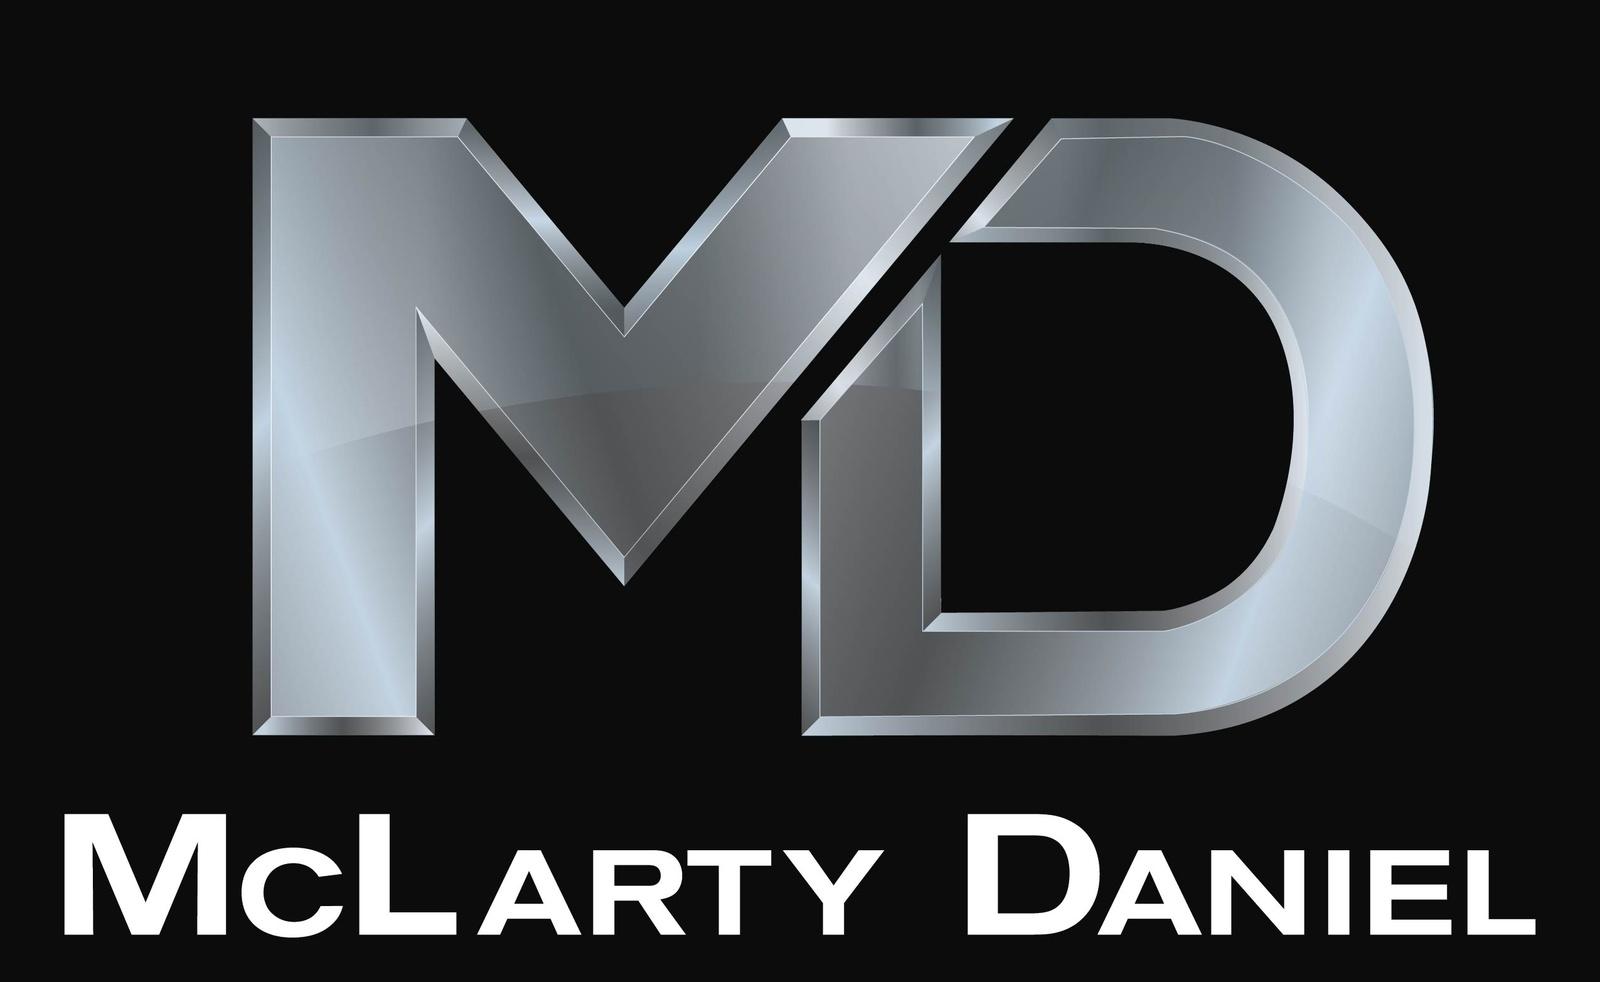 Mclarty Daniel Nissan Bentonville Ar Reviews Amp Deals